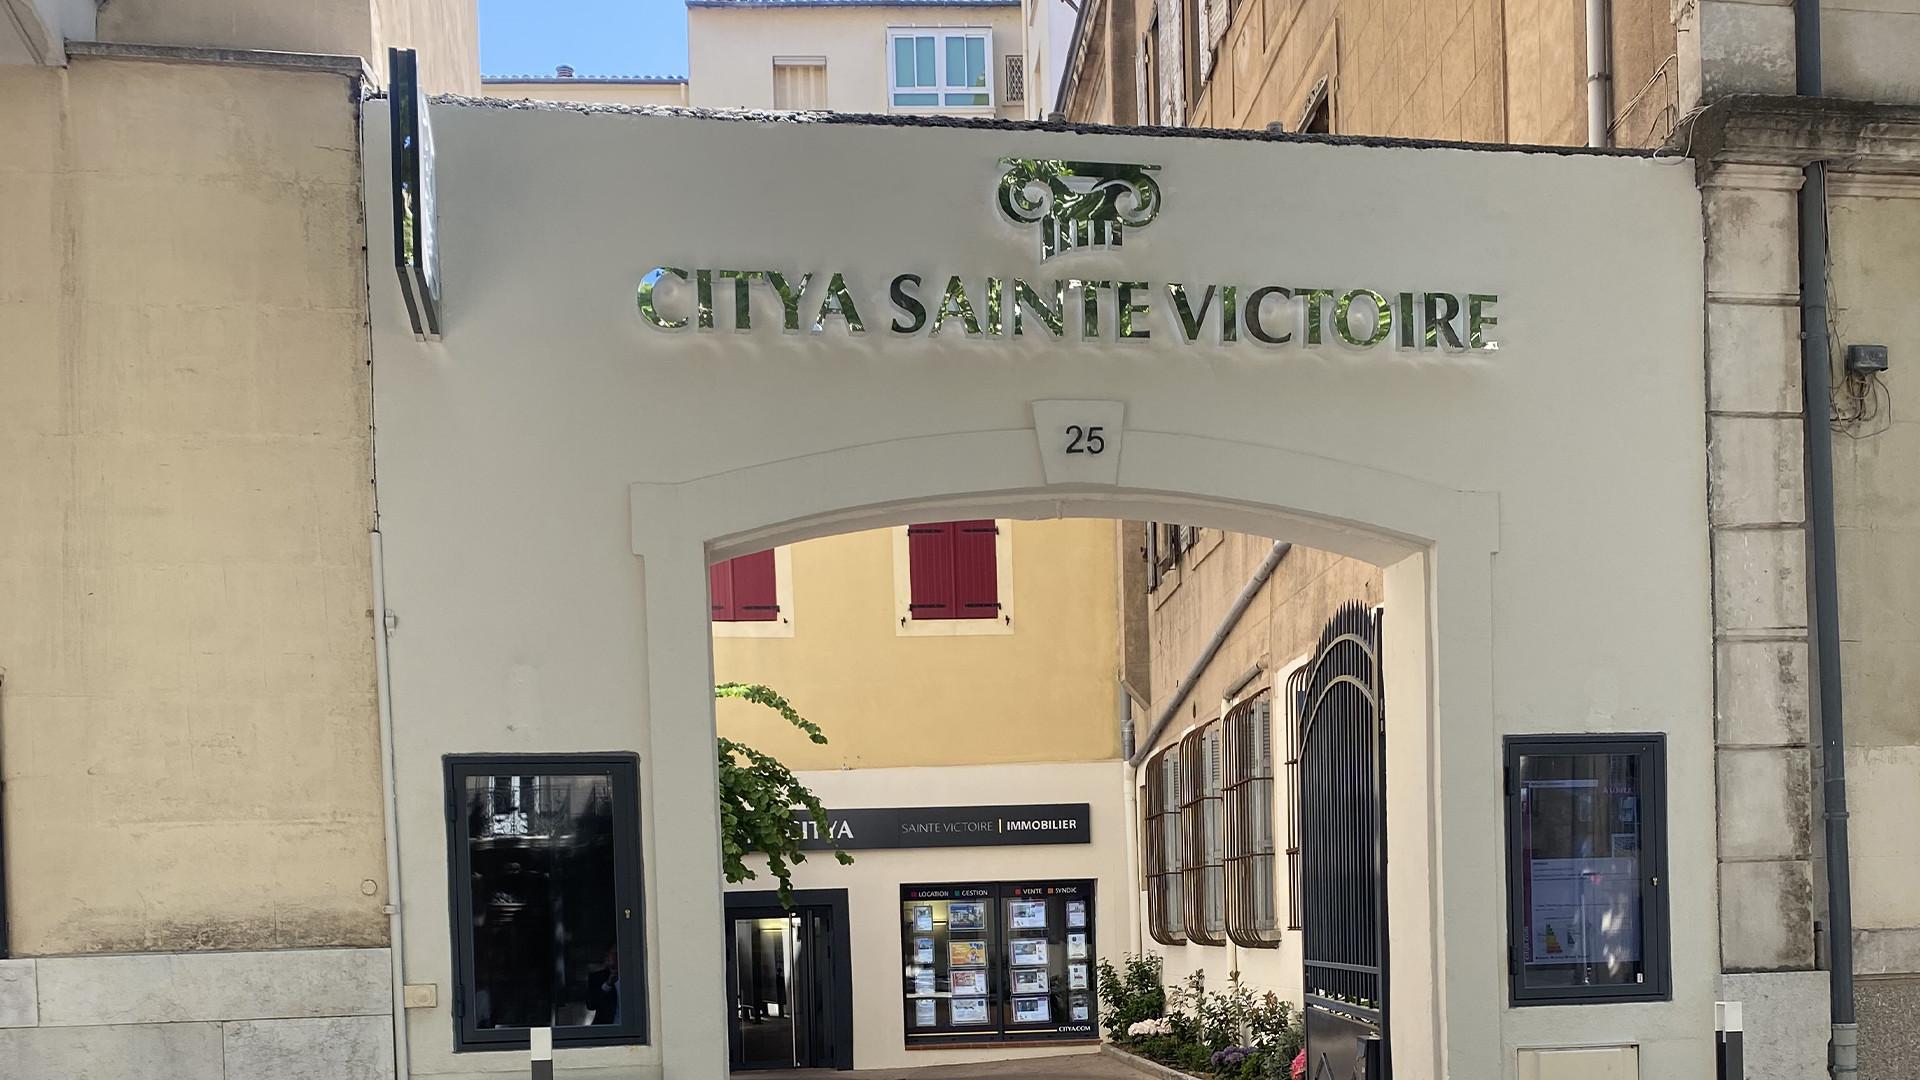 Agence immo Citya Sainte Victoire